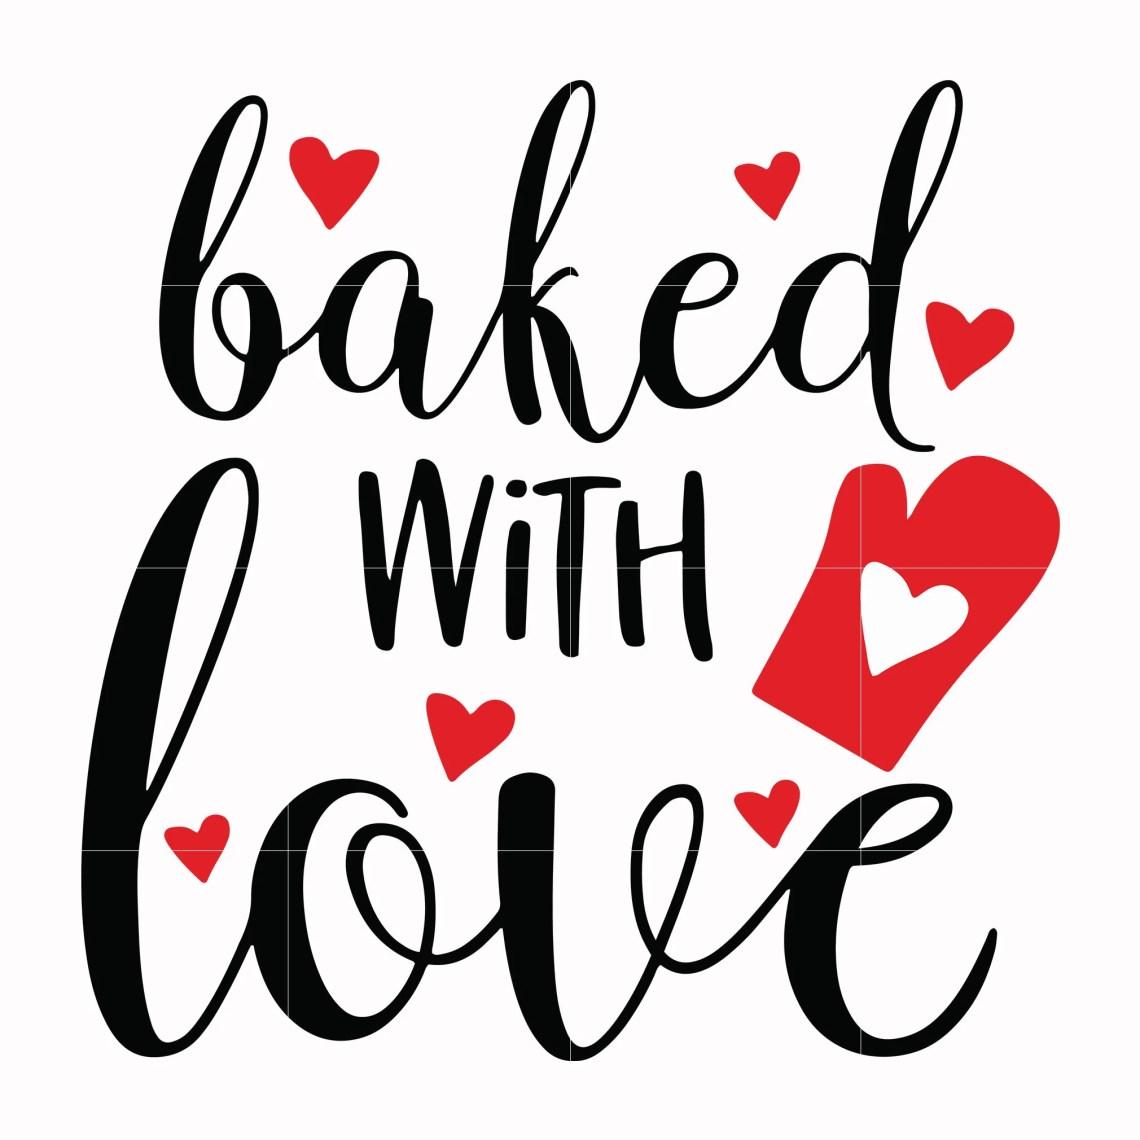 Download Baked with love svg, Love Svg, Valentine Day Svg ...